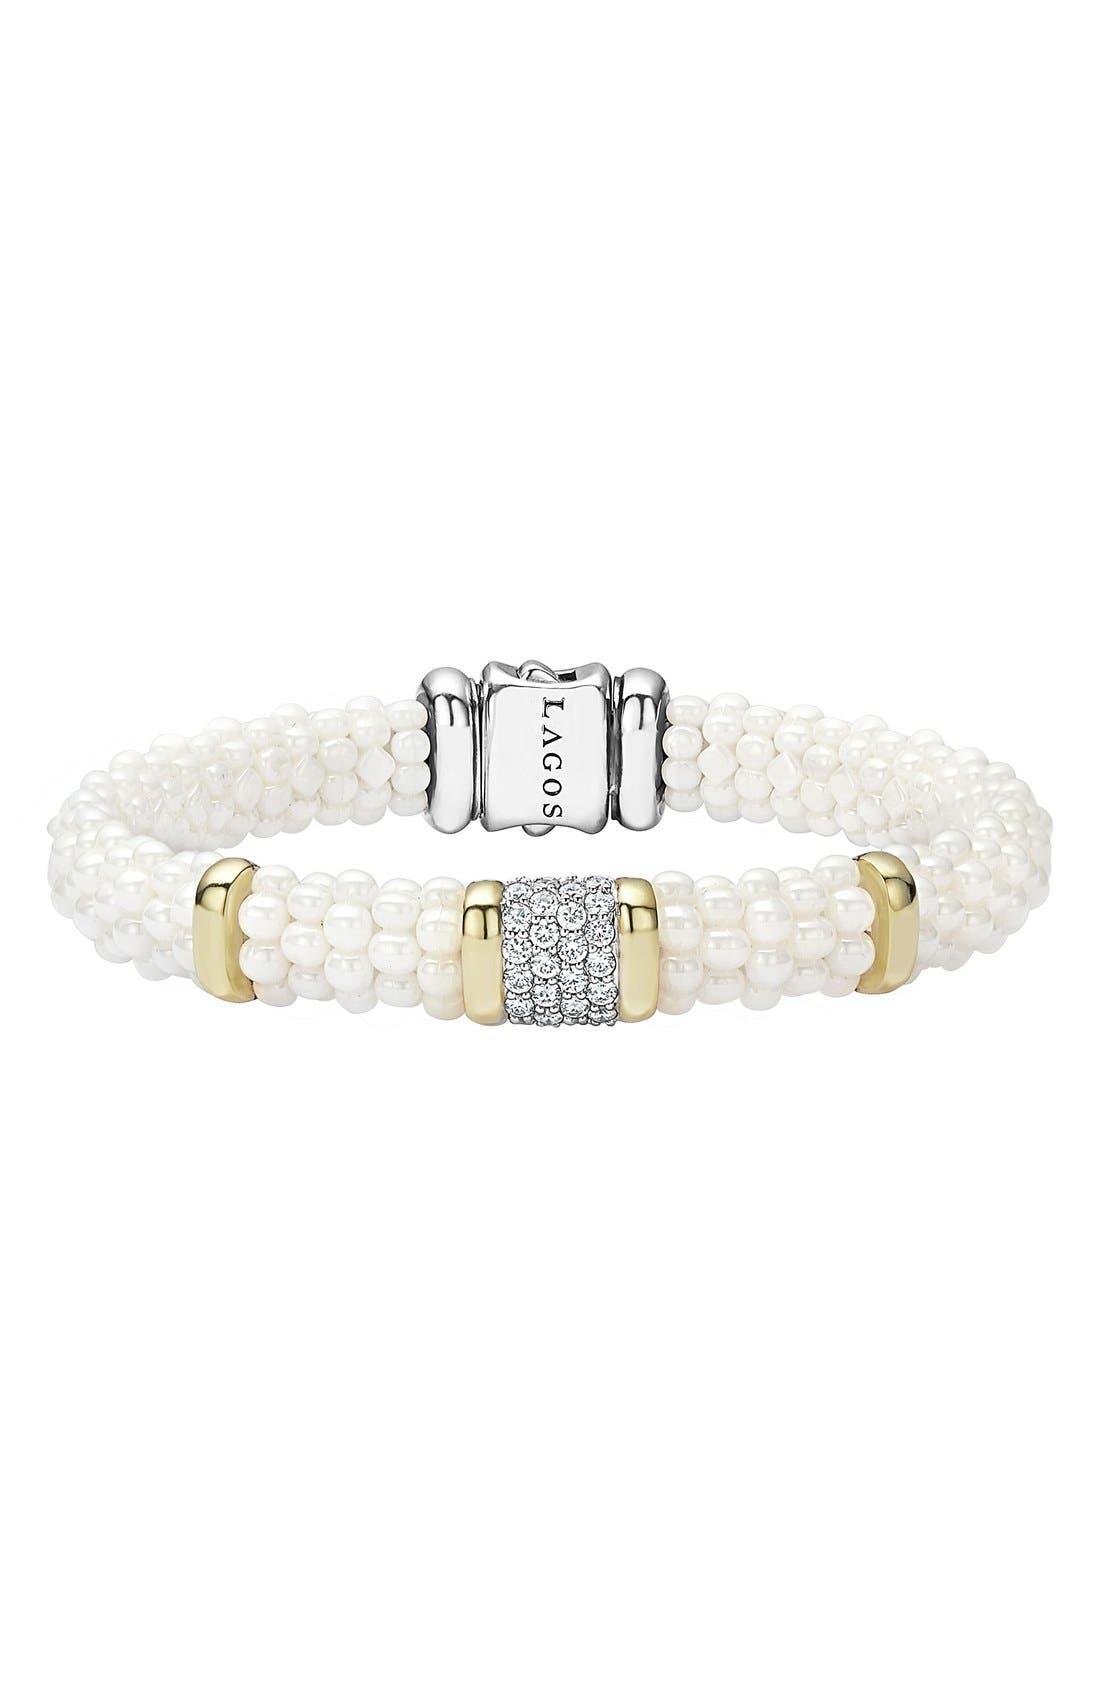 'White Caviar' Diamond Rope Bracelet,                             Main thumbnail 1, color,                             White Caviar